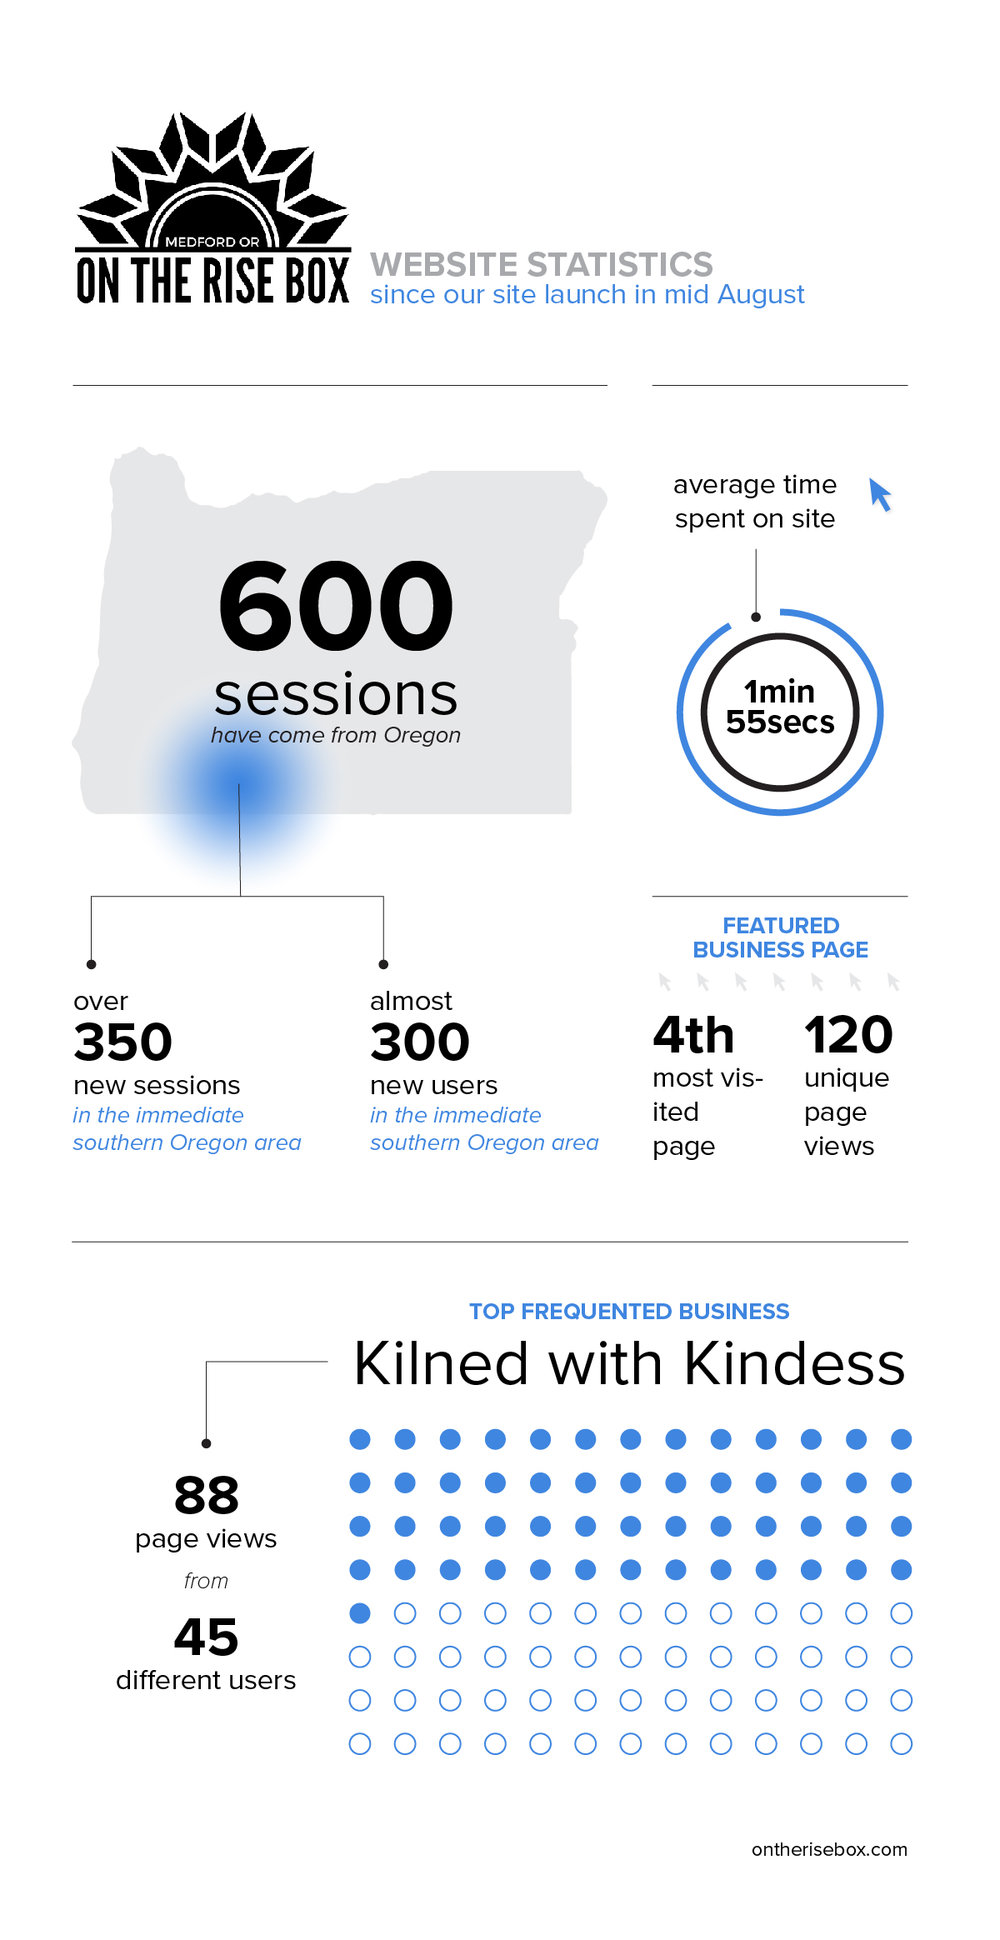 OTR_infographic_EB2.jpg